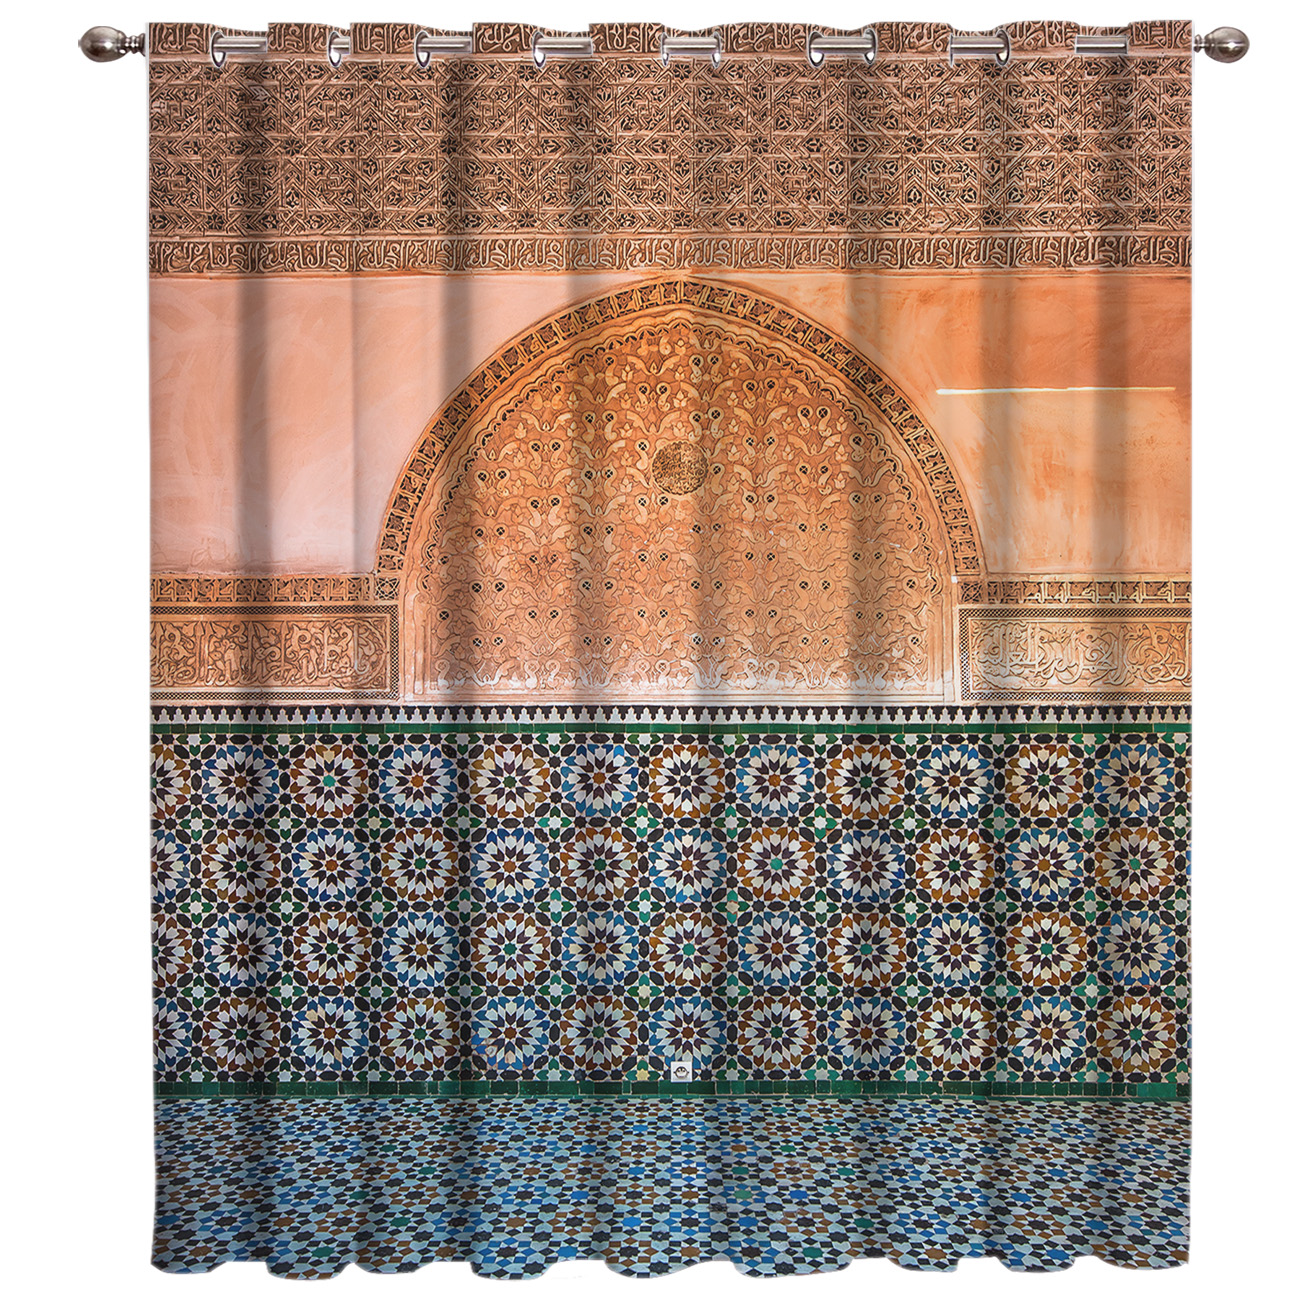 Vintage Moroccan Geometric Checks Window Treatments Curtains Valance Window Blinds Bedroom Curtains Bathroom Kitchen Bedroom